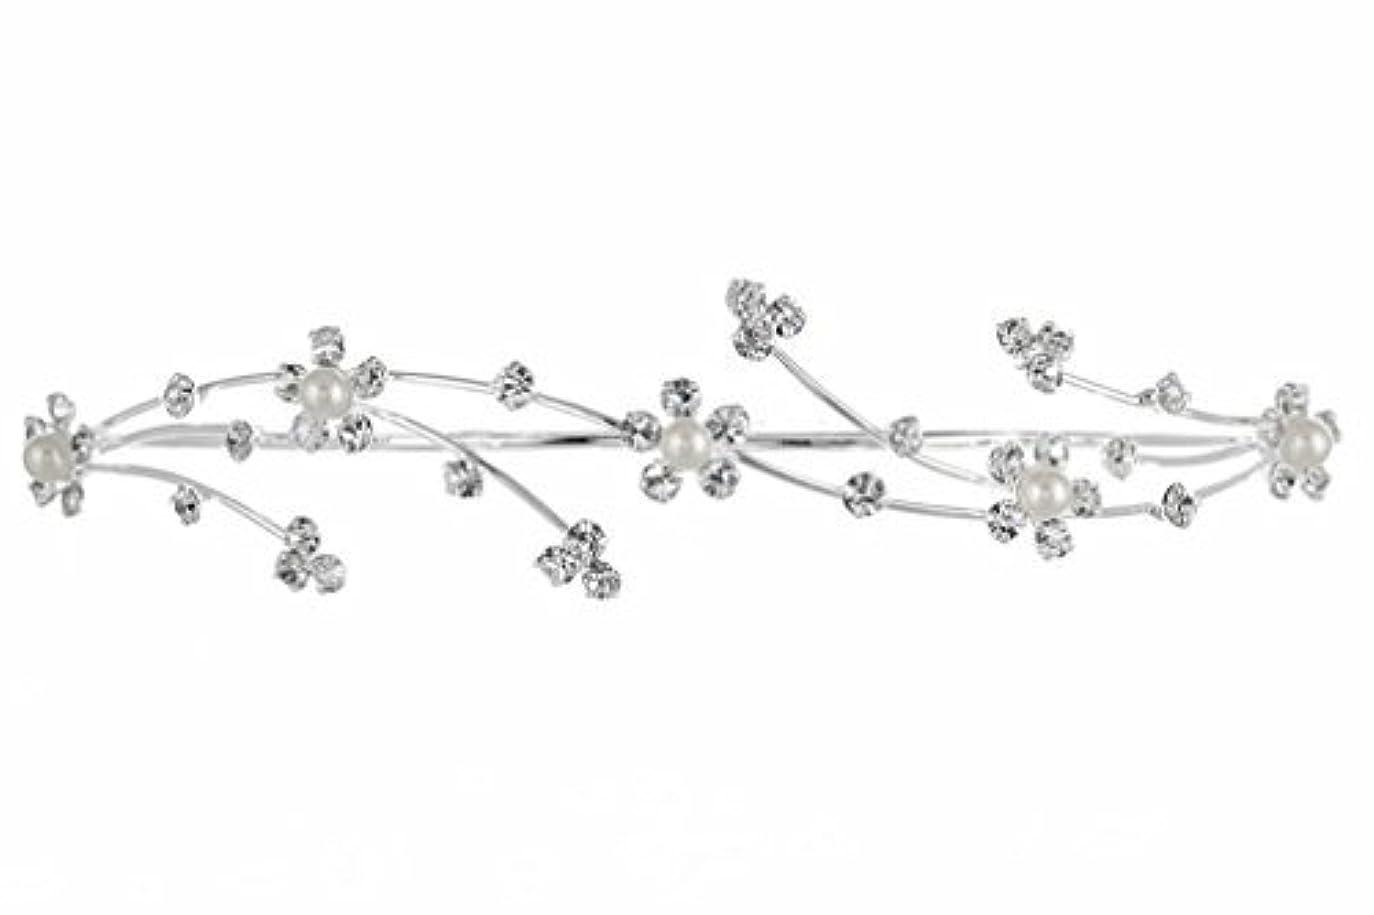 Elegant Flower Girl Bridesmaid Tiara Hair Comb - Silver Plated Faux Pearls T160 [並行輸入品]